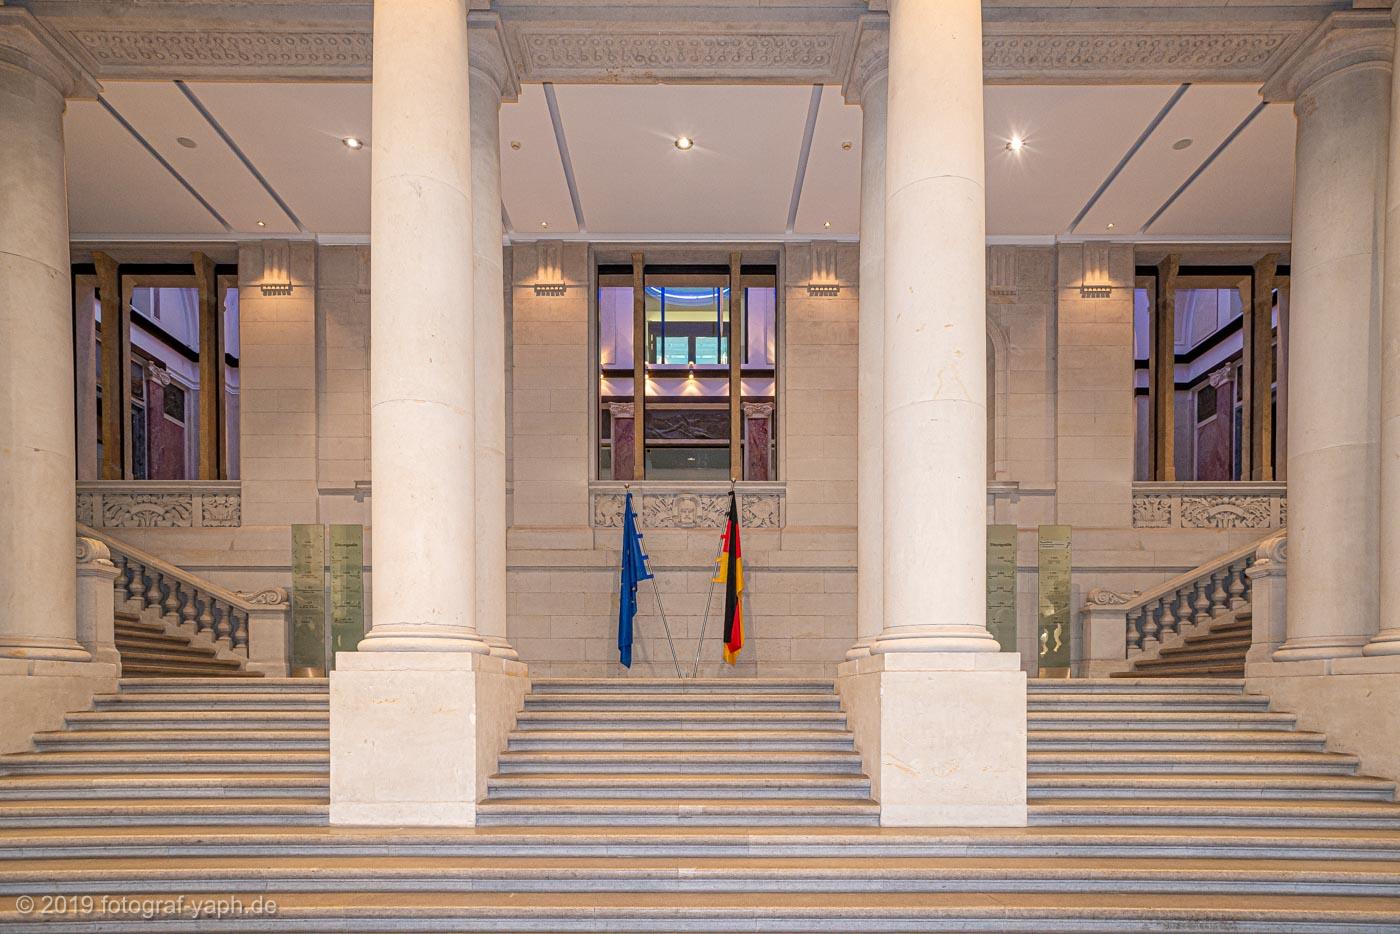 monumentale Architektur des Bundesrats Berlin fotografiert von Fotostudio Trier Yaph